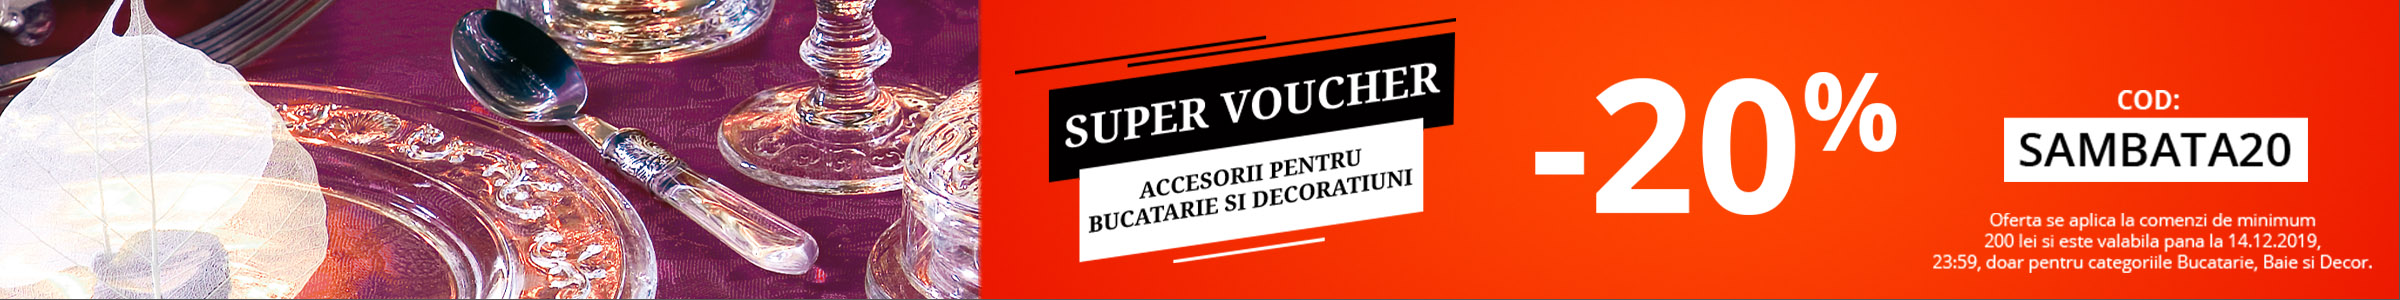 Super voucher - kitchen&bathro